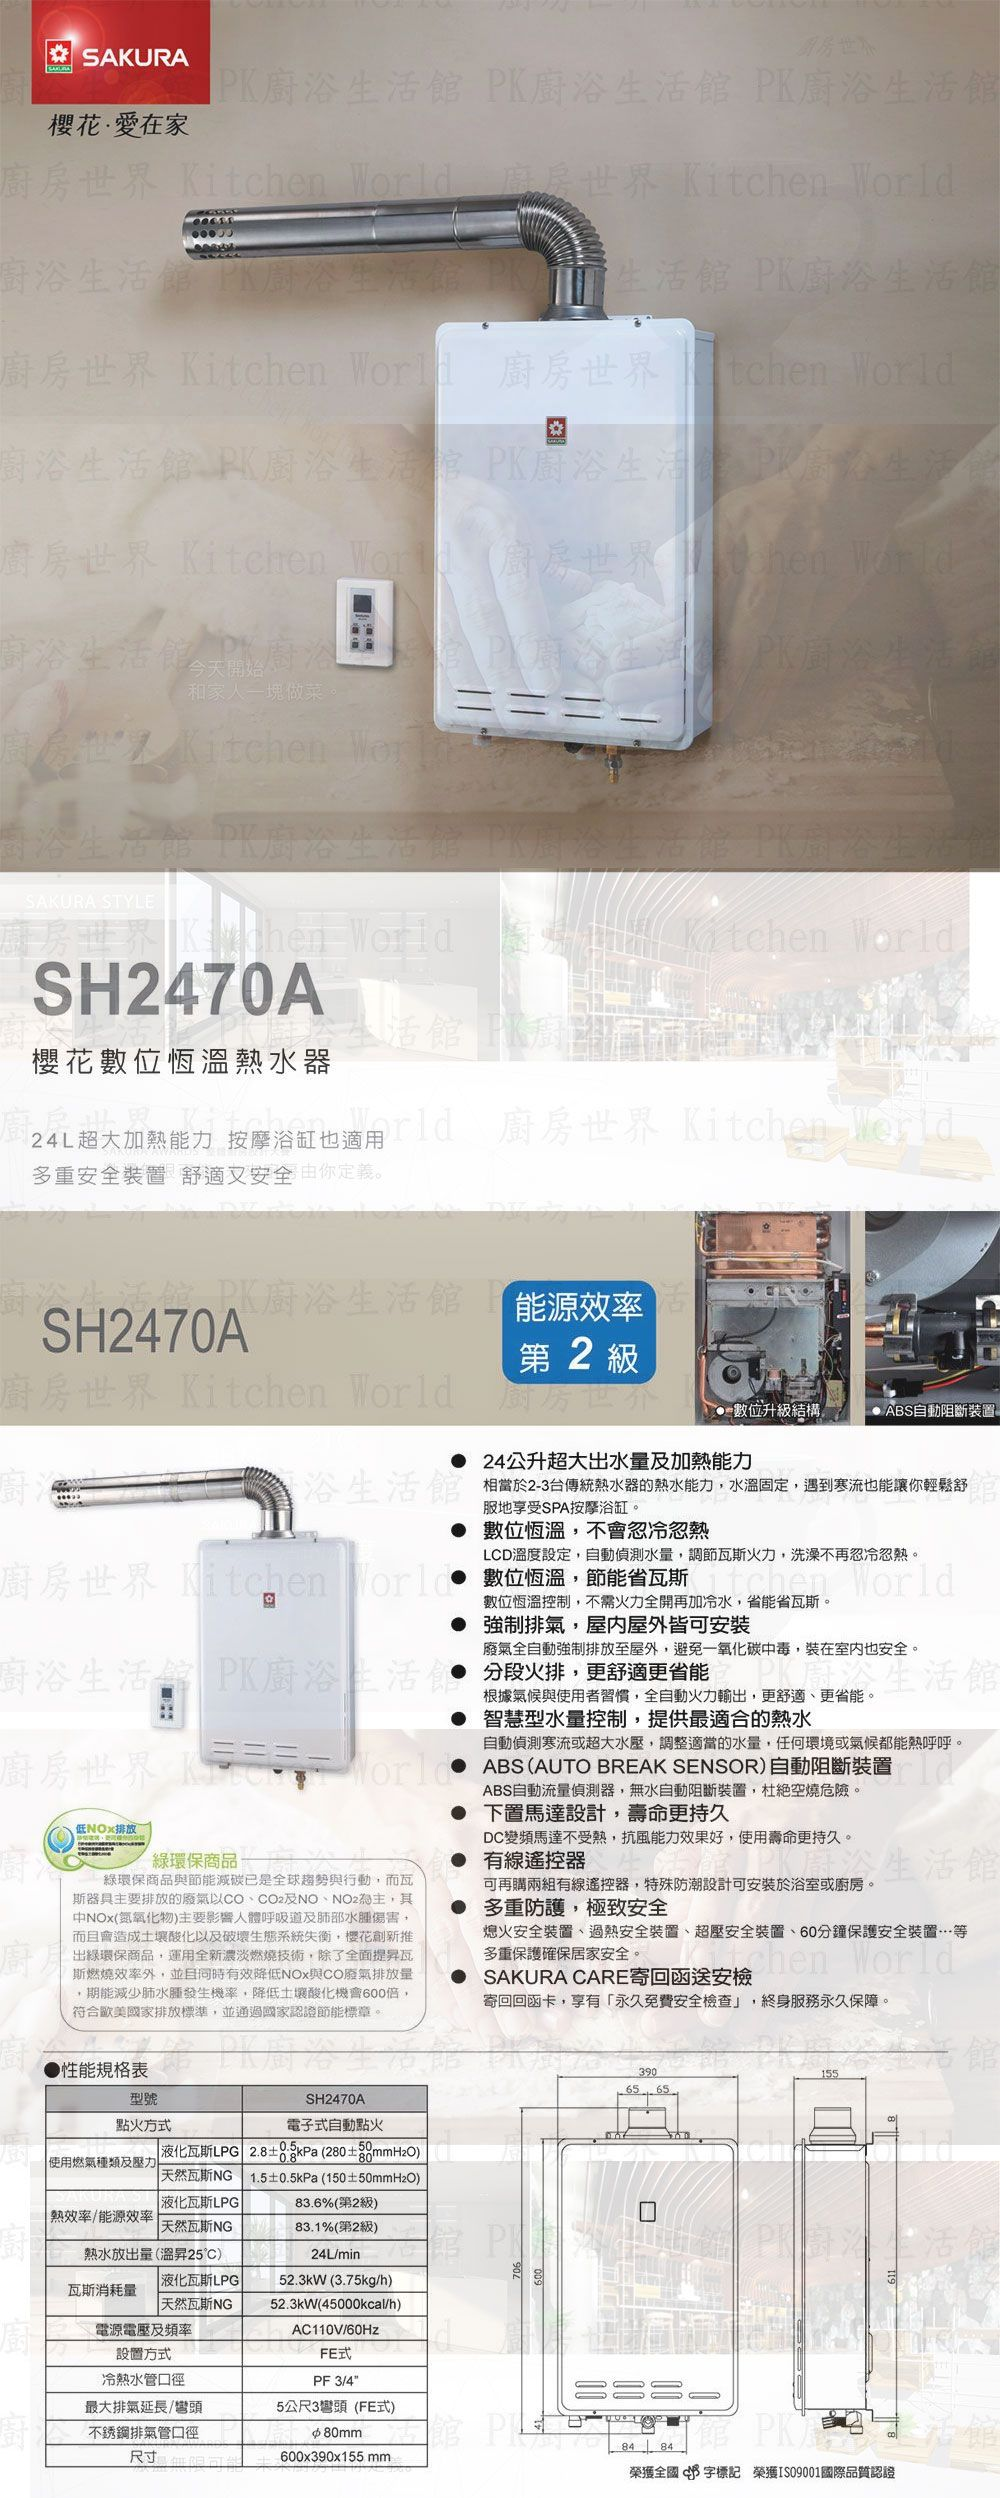 PK/goods/SAKURA/Water Heater/SH2470A-DM-1.jpg